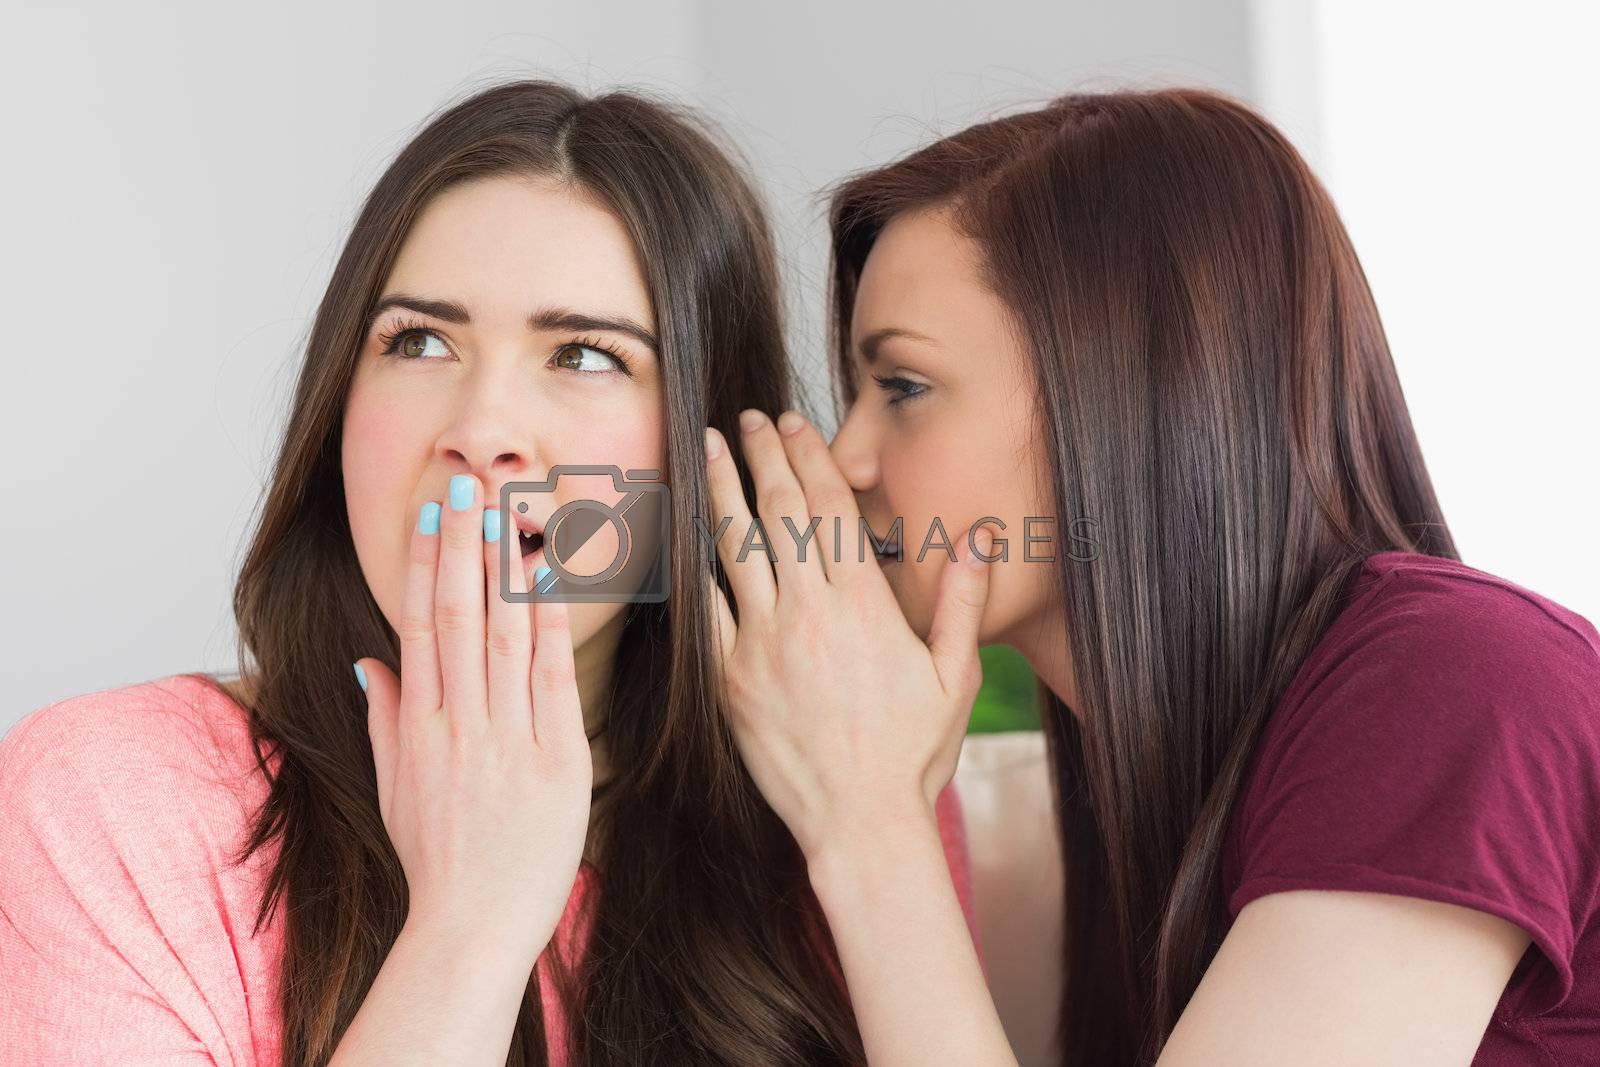 Two smiling girls sharing secrets by Wavebreakmedia